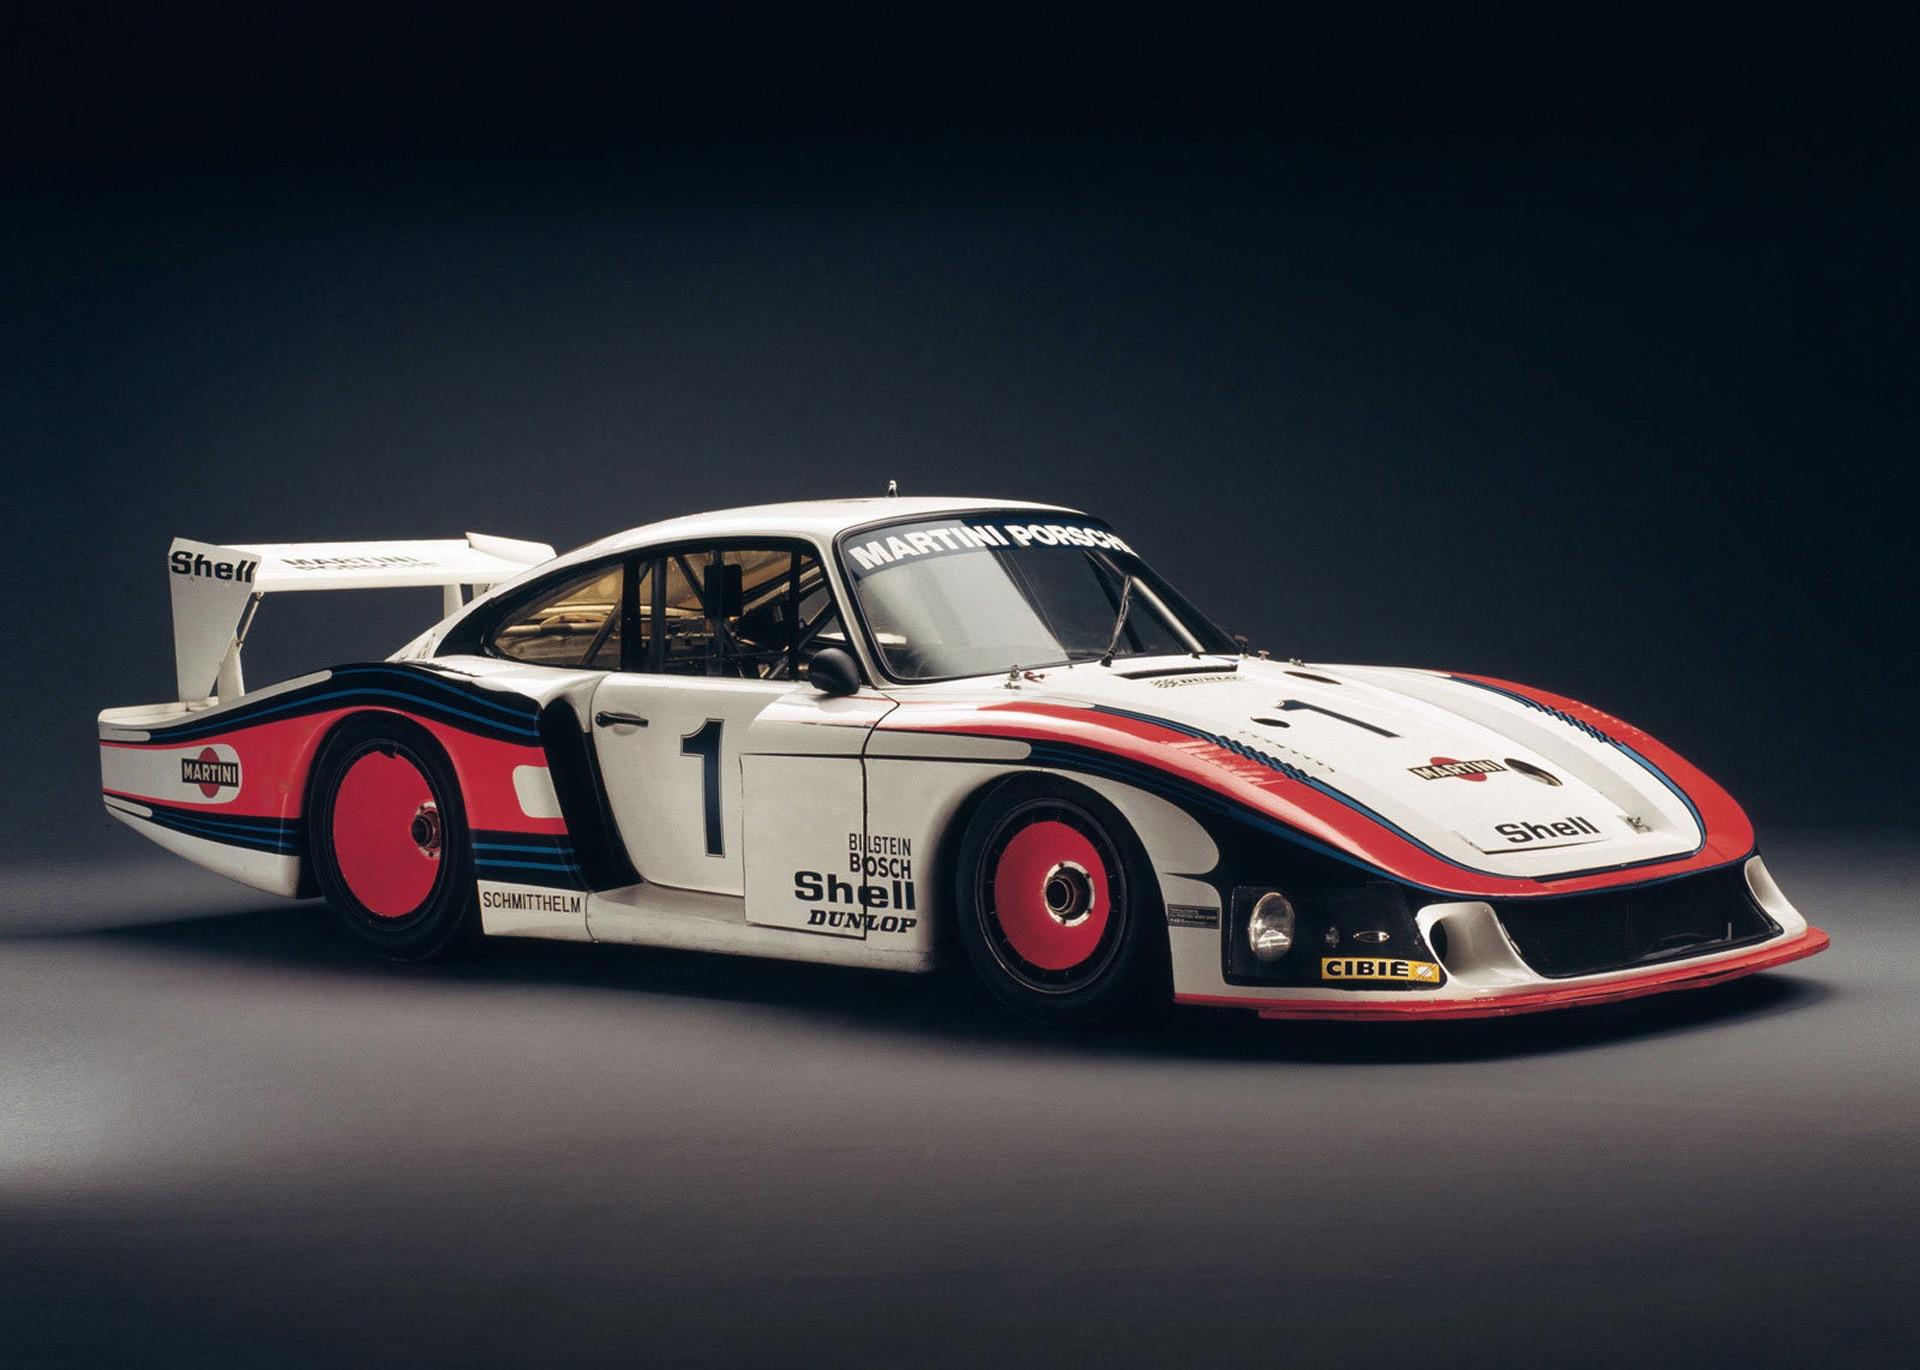 1978-porsche-935-78-coupe-moby-dick_1.jpg